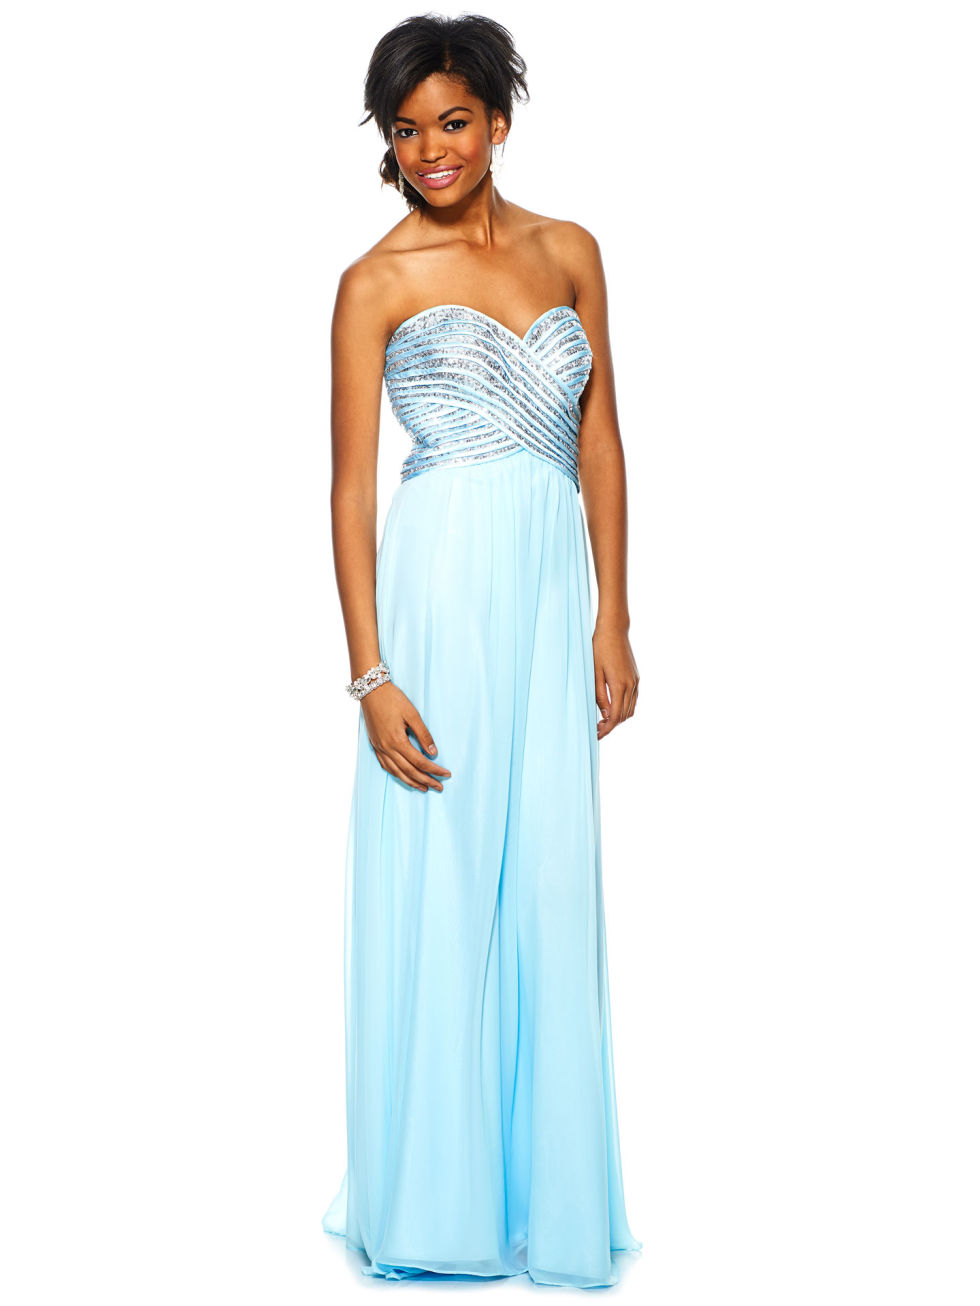 Boscovs Prom Dresses Cocktail Dresses 2016